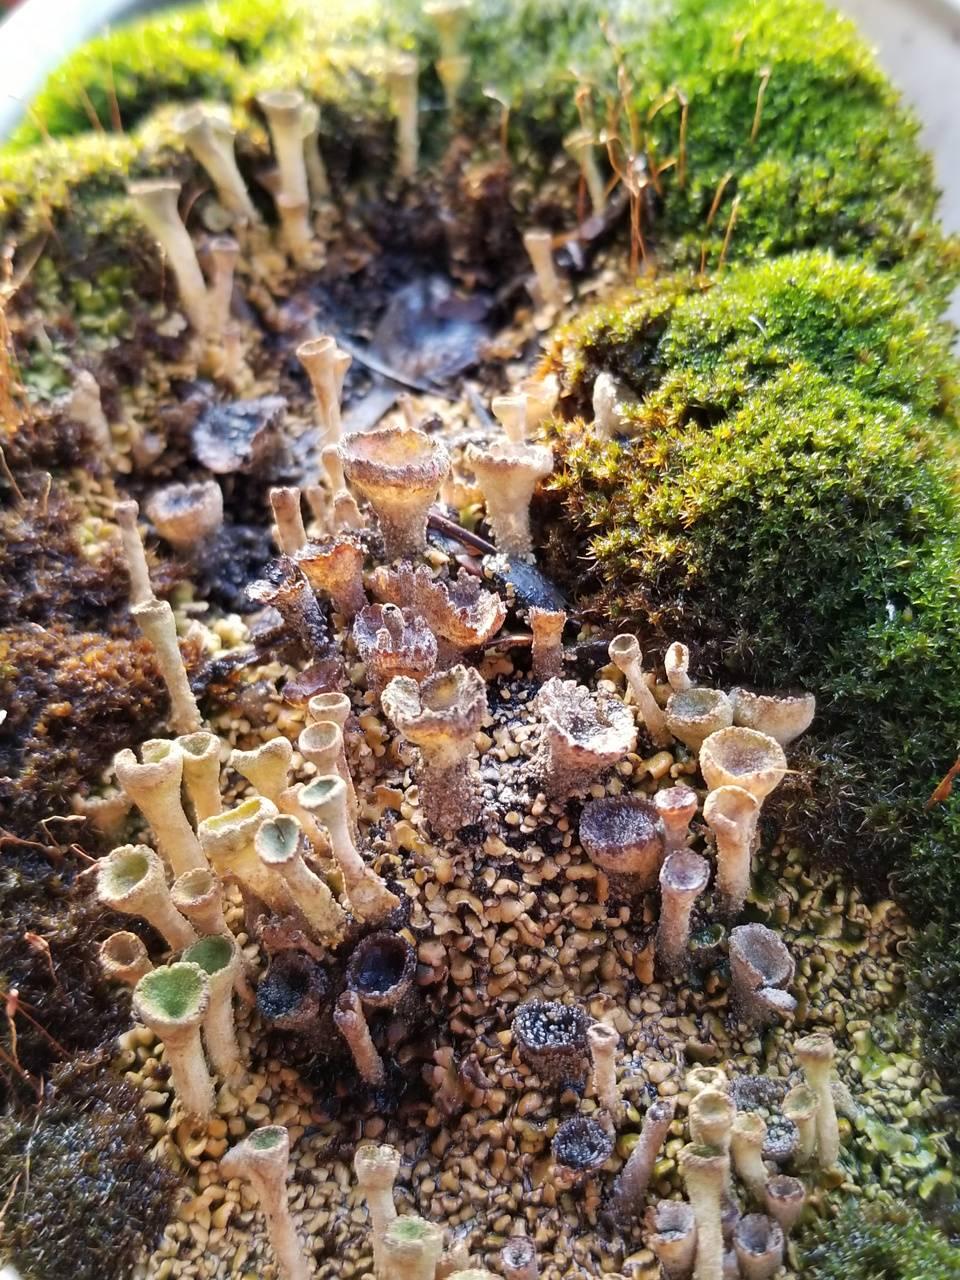 Syfy moss